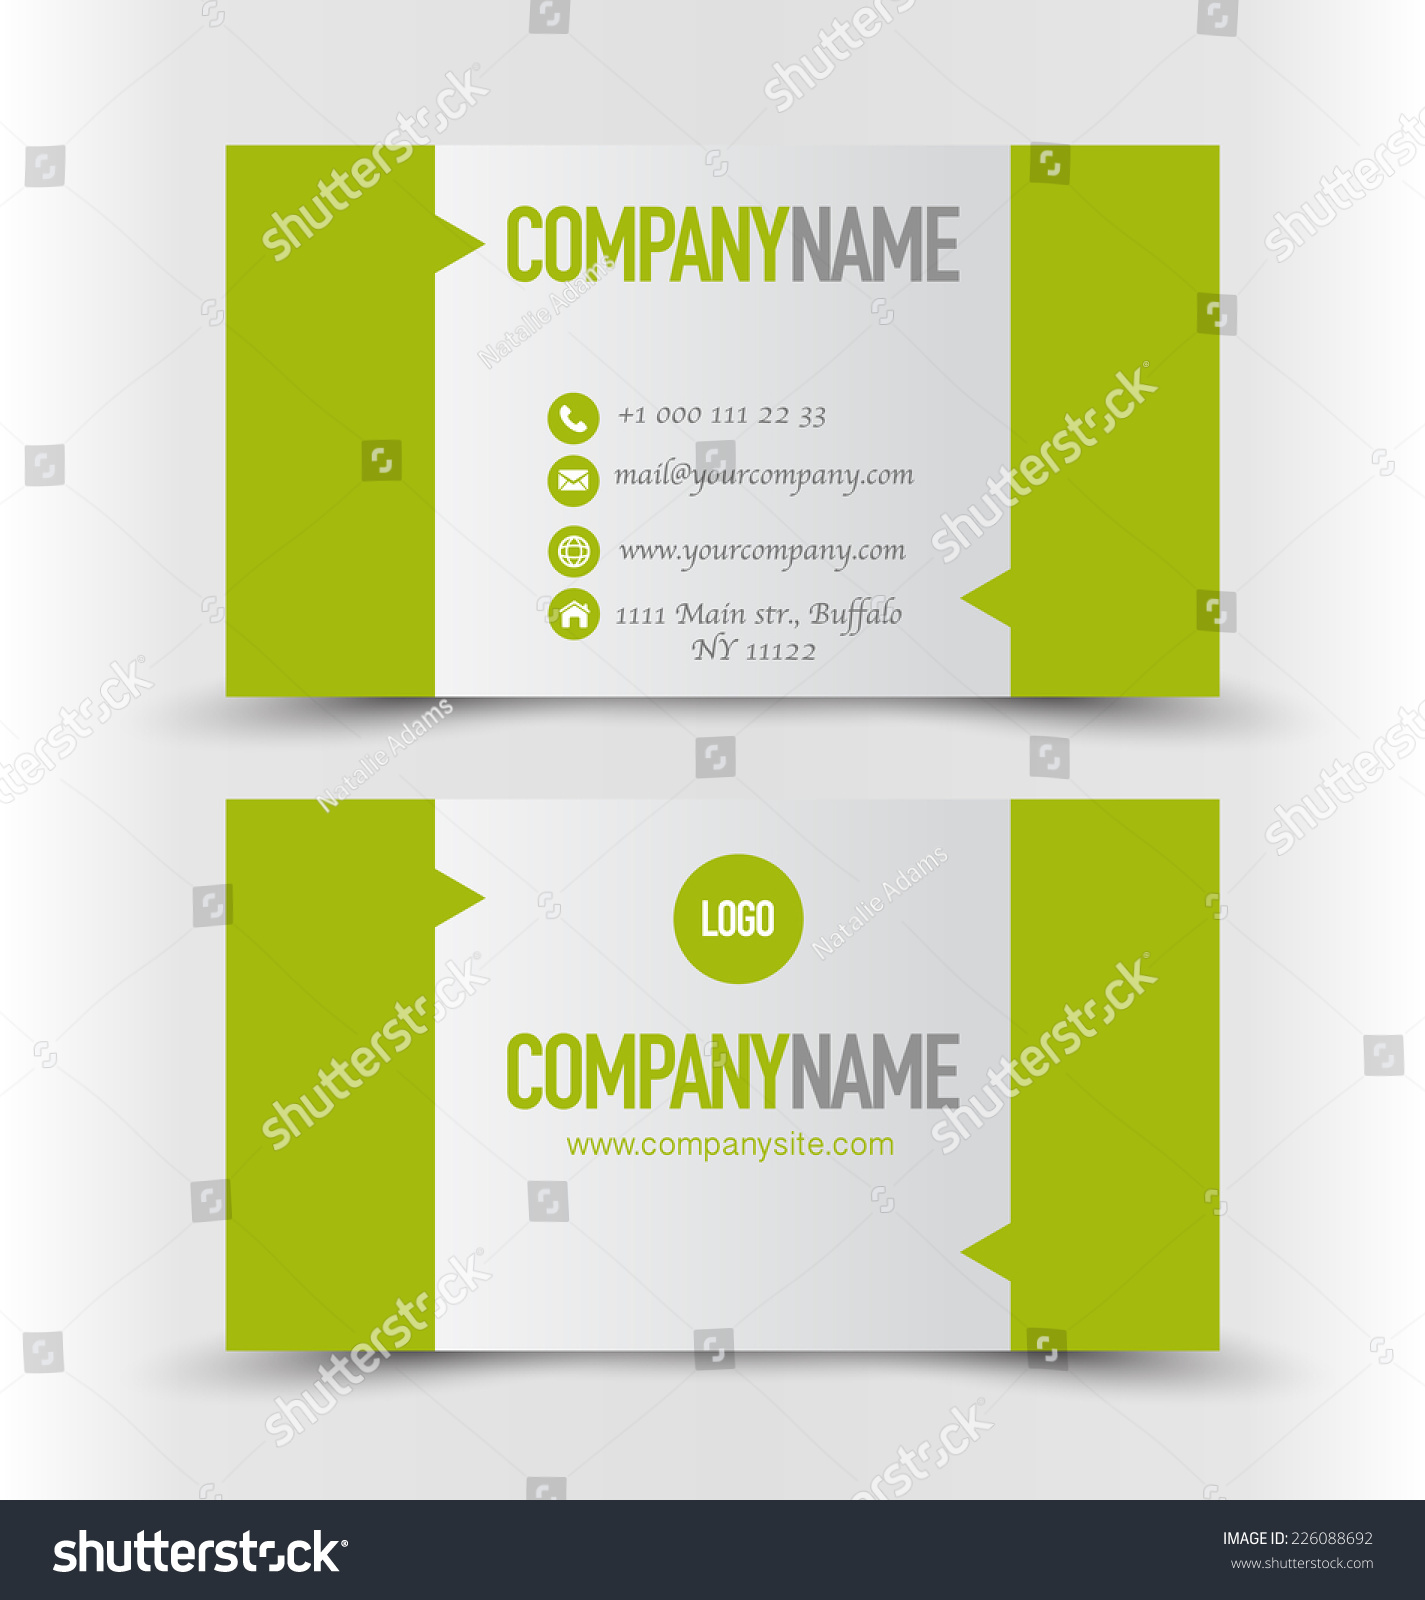 Business card set templategreen silver grey stock vector 226088692 business card set templateeen and silver grey color vector illustration magicingreecefo Choice Image